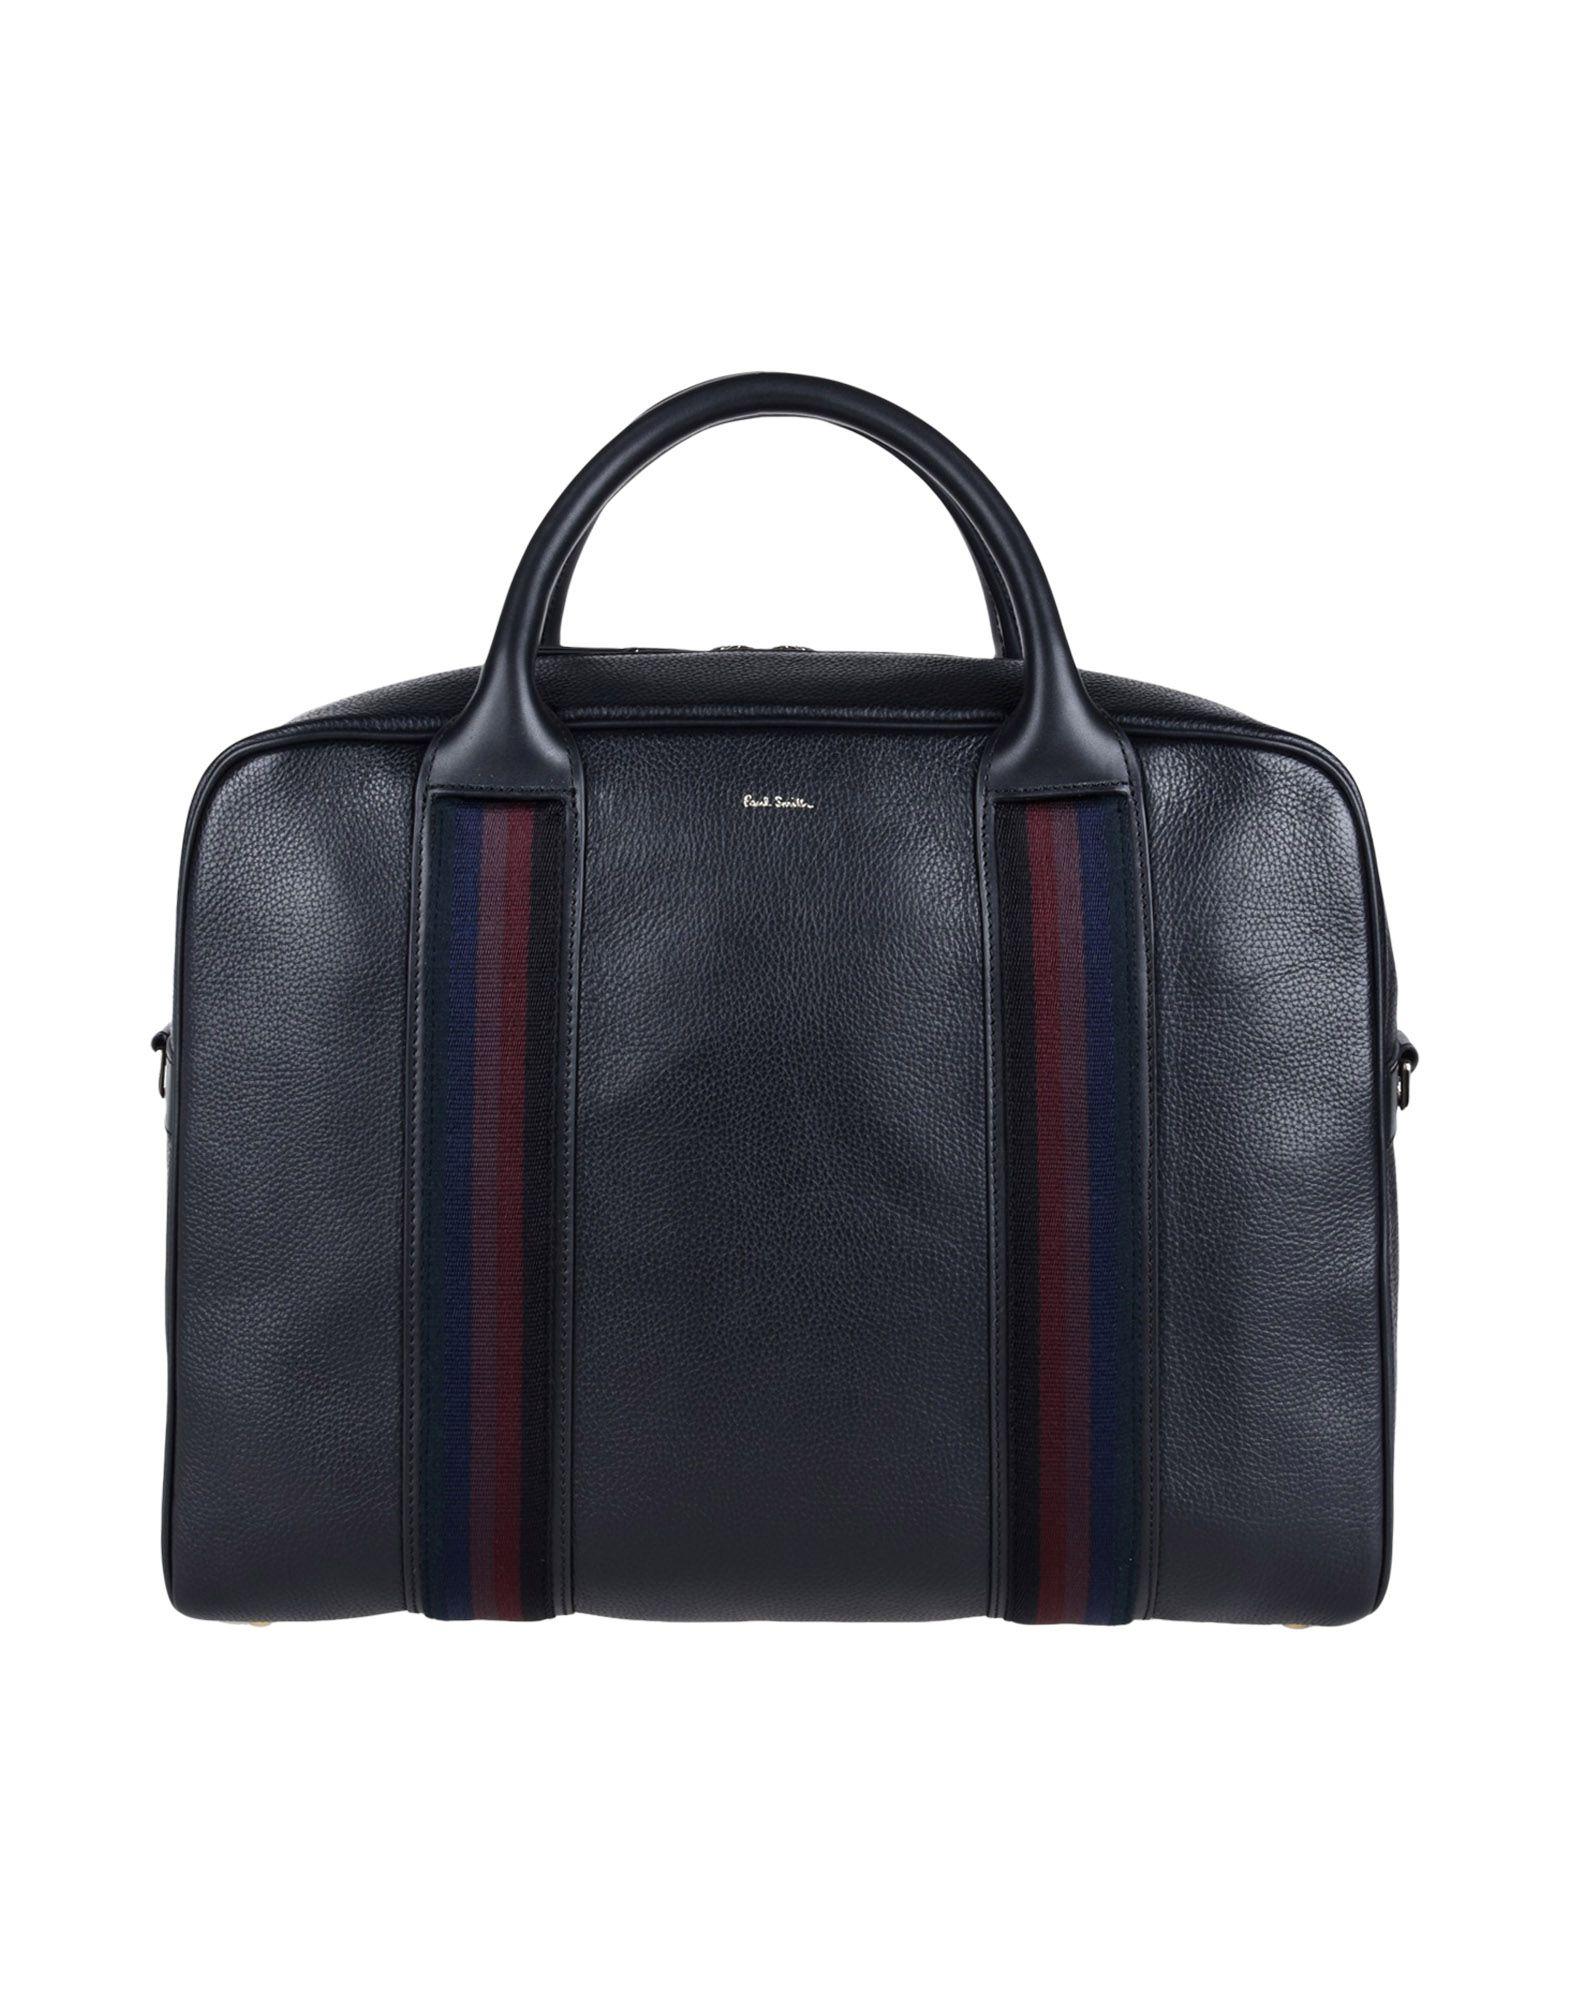 PAUL SMITH Деловые сумки victorinox деловые сумки